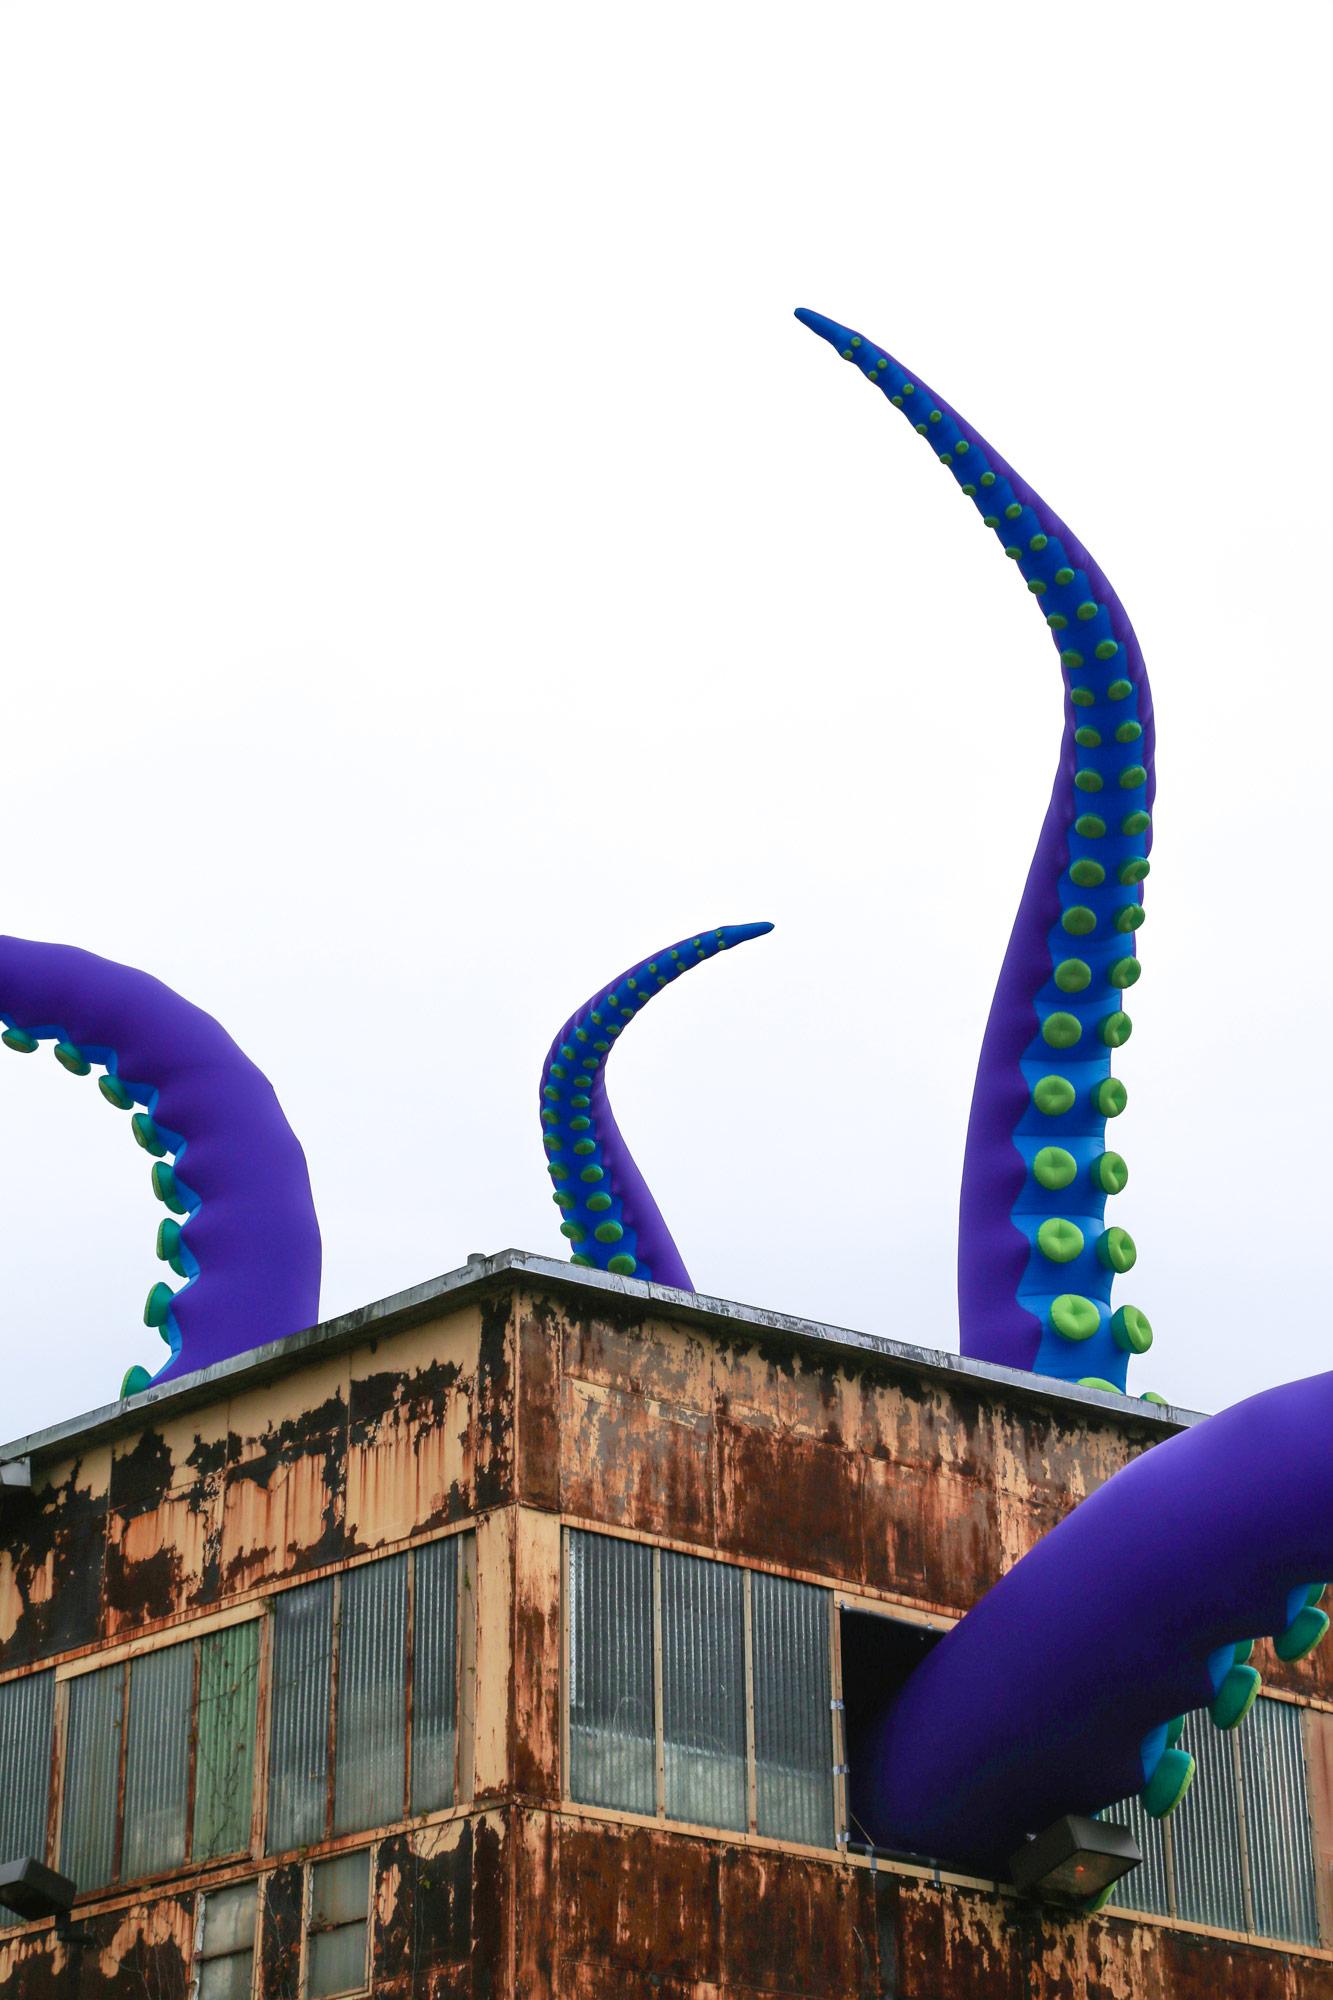 A Gargantuan Purple Sea Monster Lurks Inside a Two-Story Warehouse at Philadelphia's Navy Yard